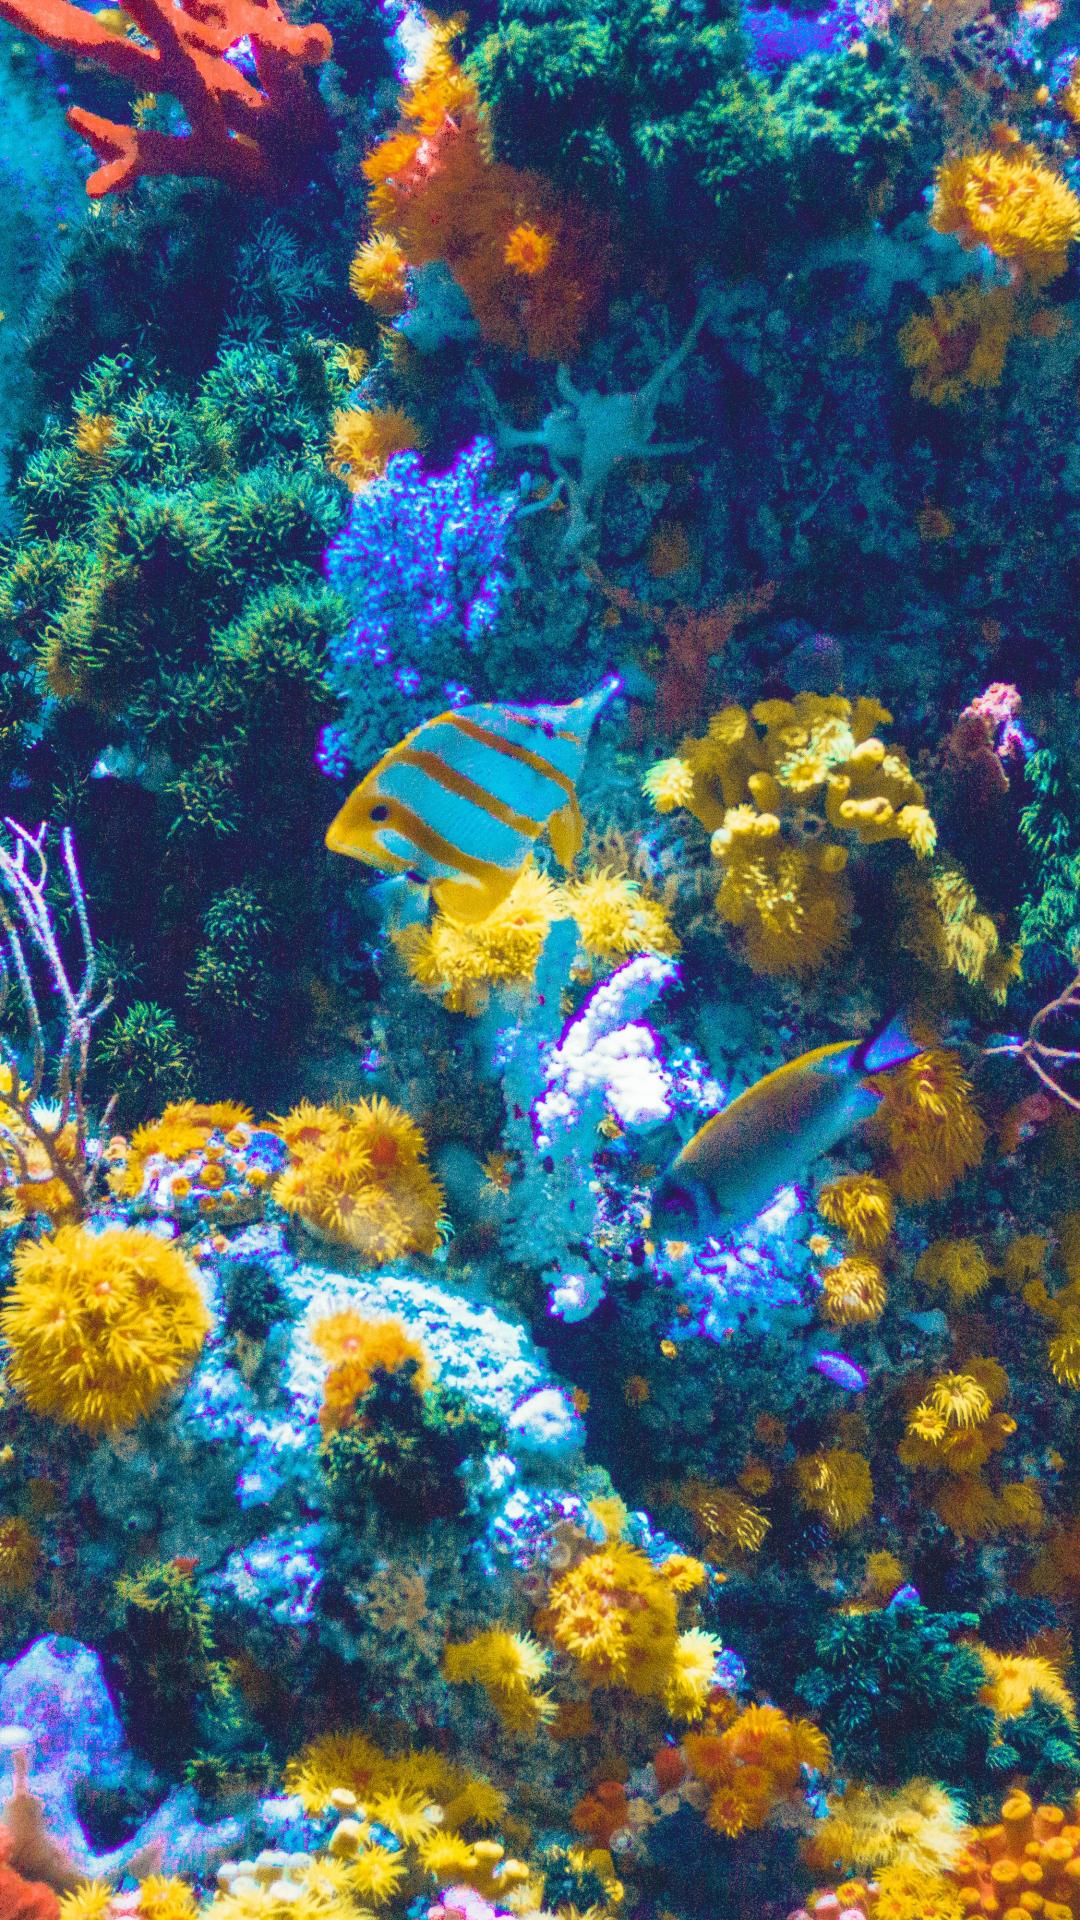 Aquarium And Fish IPhone Wallpaper